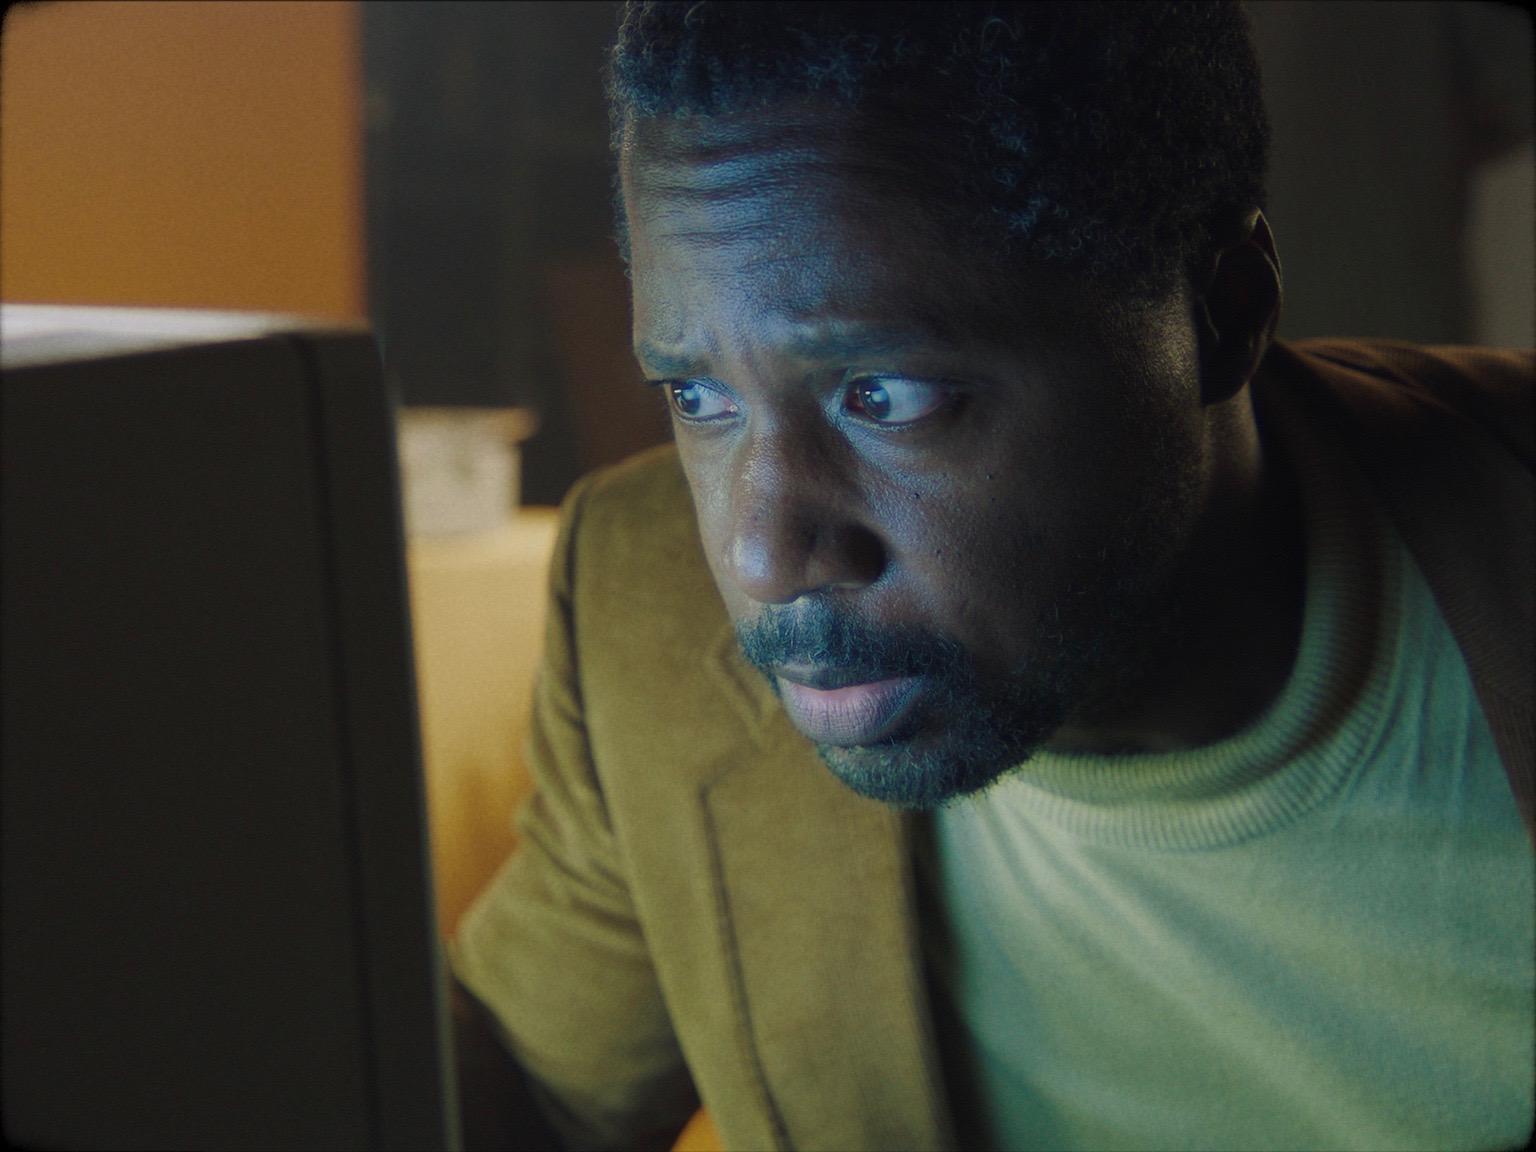 DeJean Brown as Daryl Mundi in Who You Are. Dir. Joel Jay Blacker. Shot by Tanner Hall.